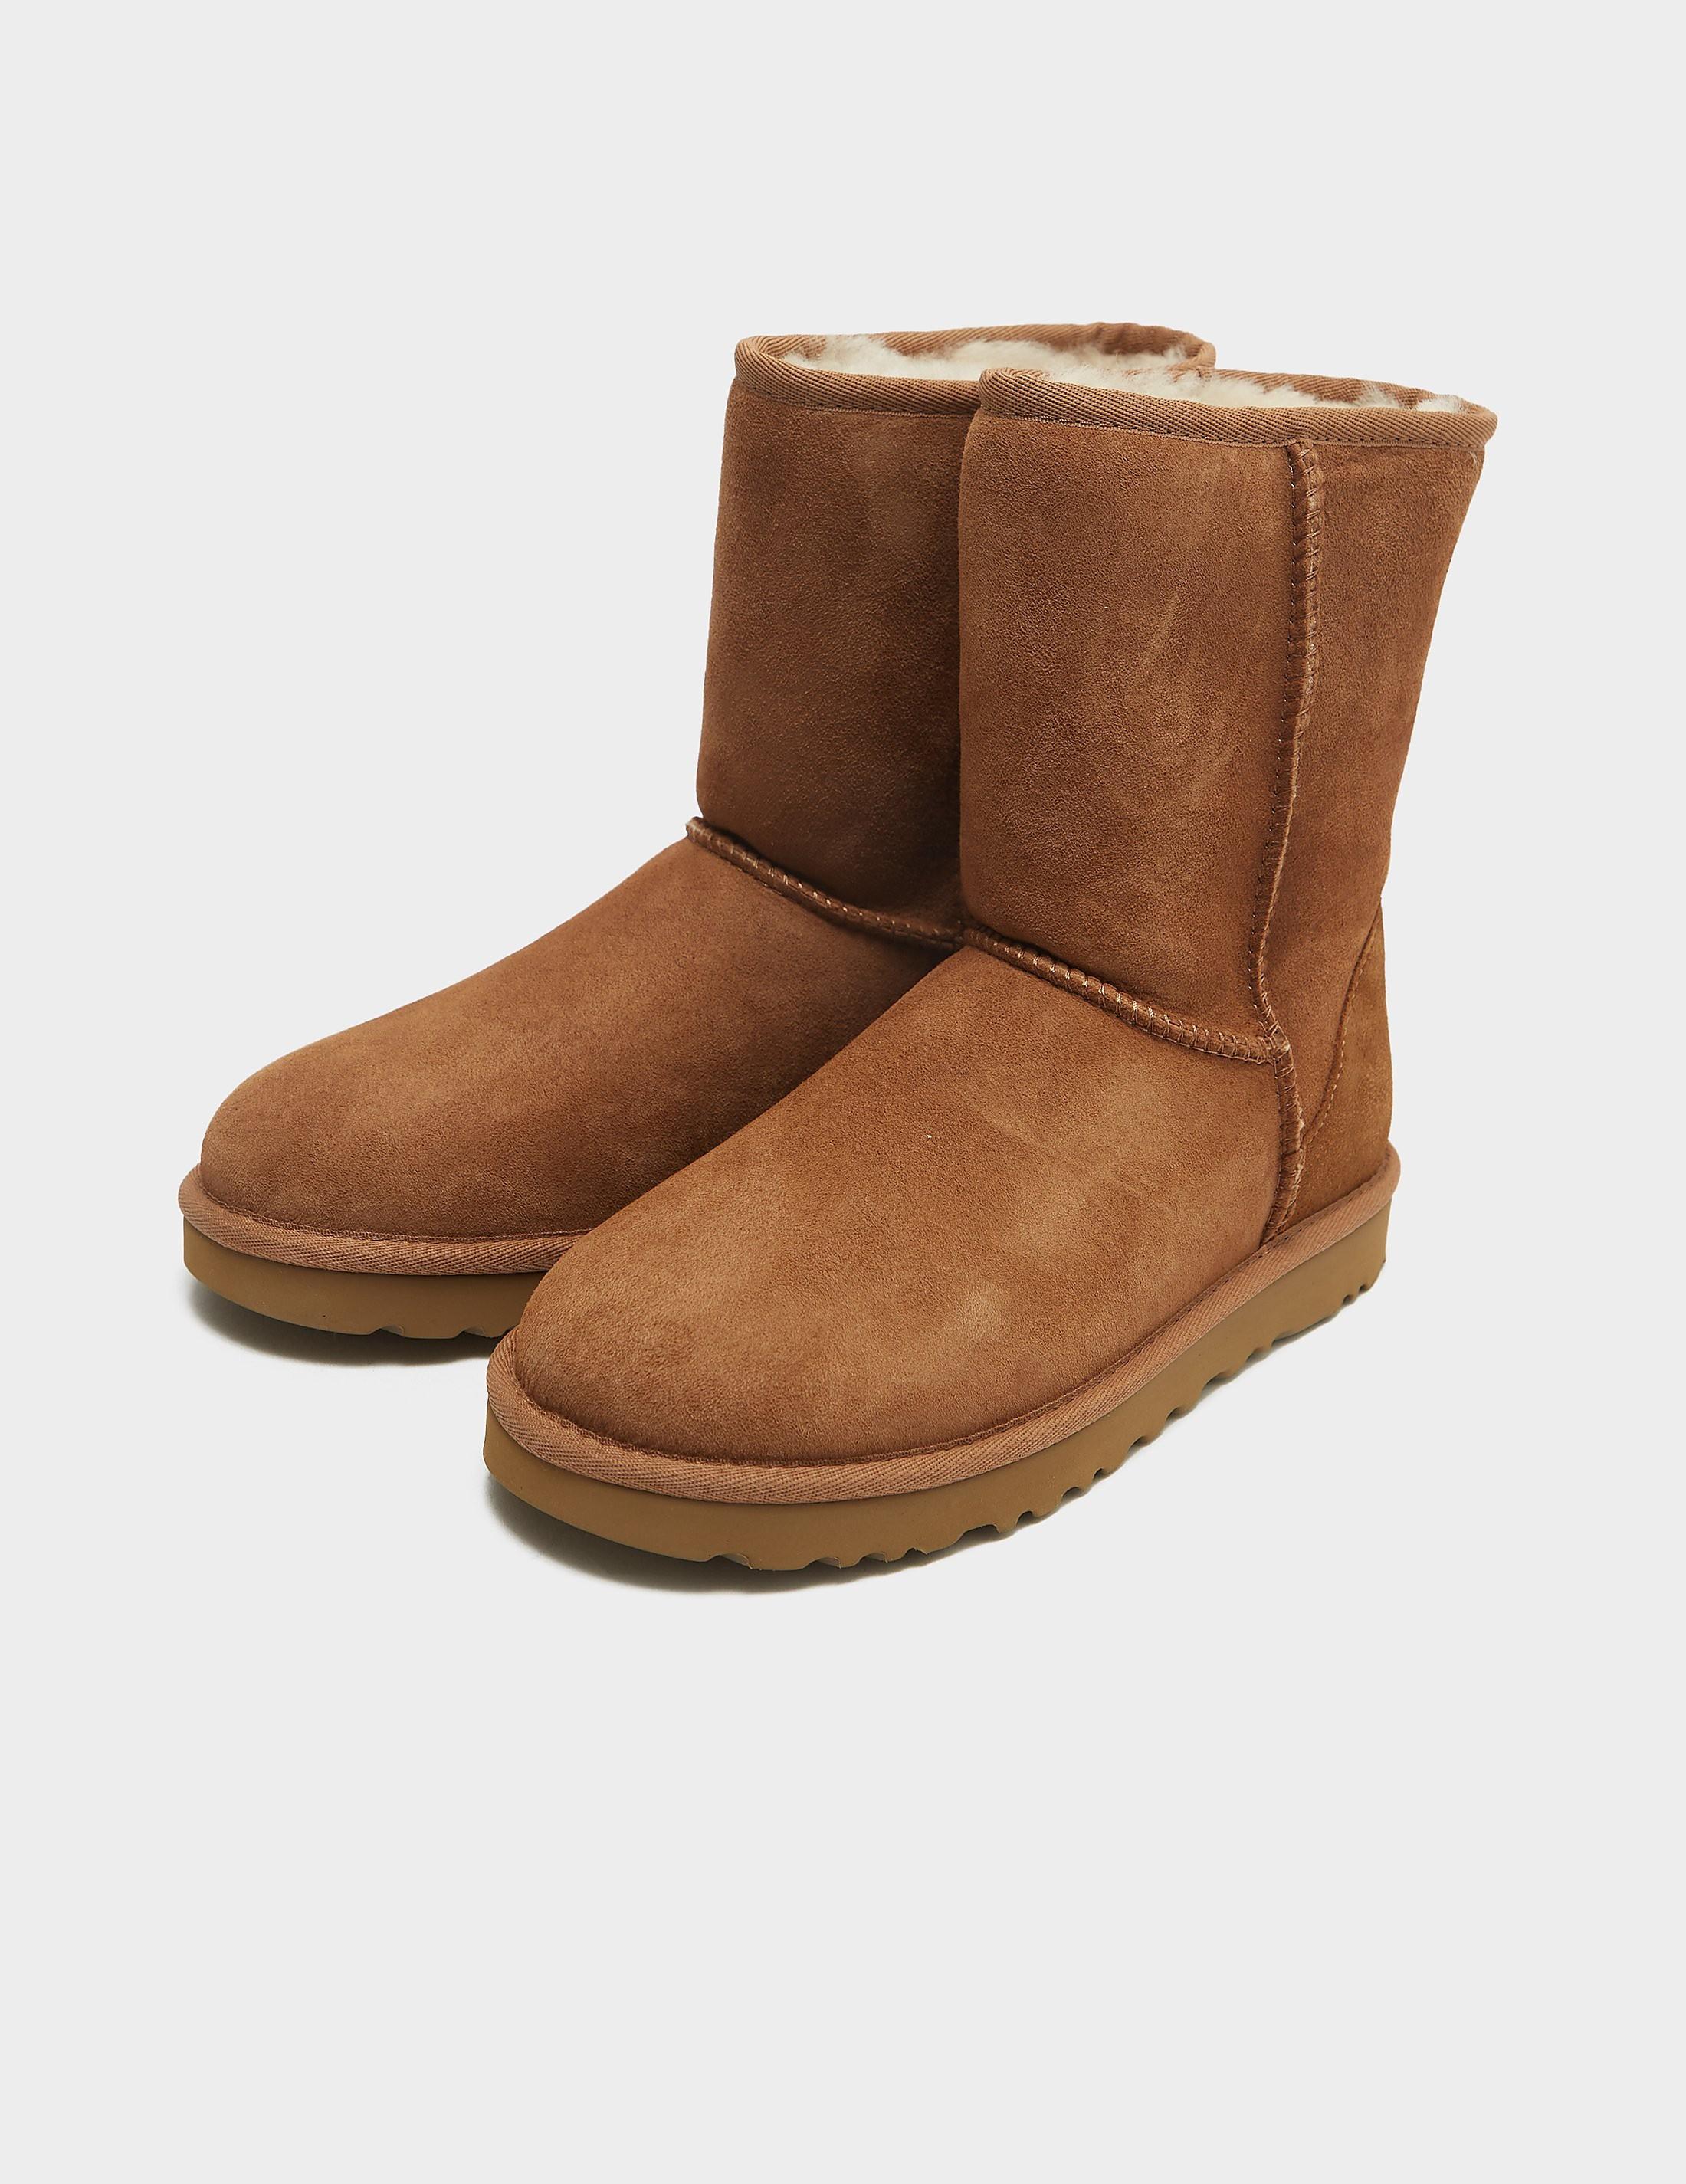 UGG Classic Short2 Boot - Online Exclusive